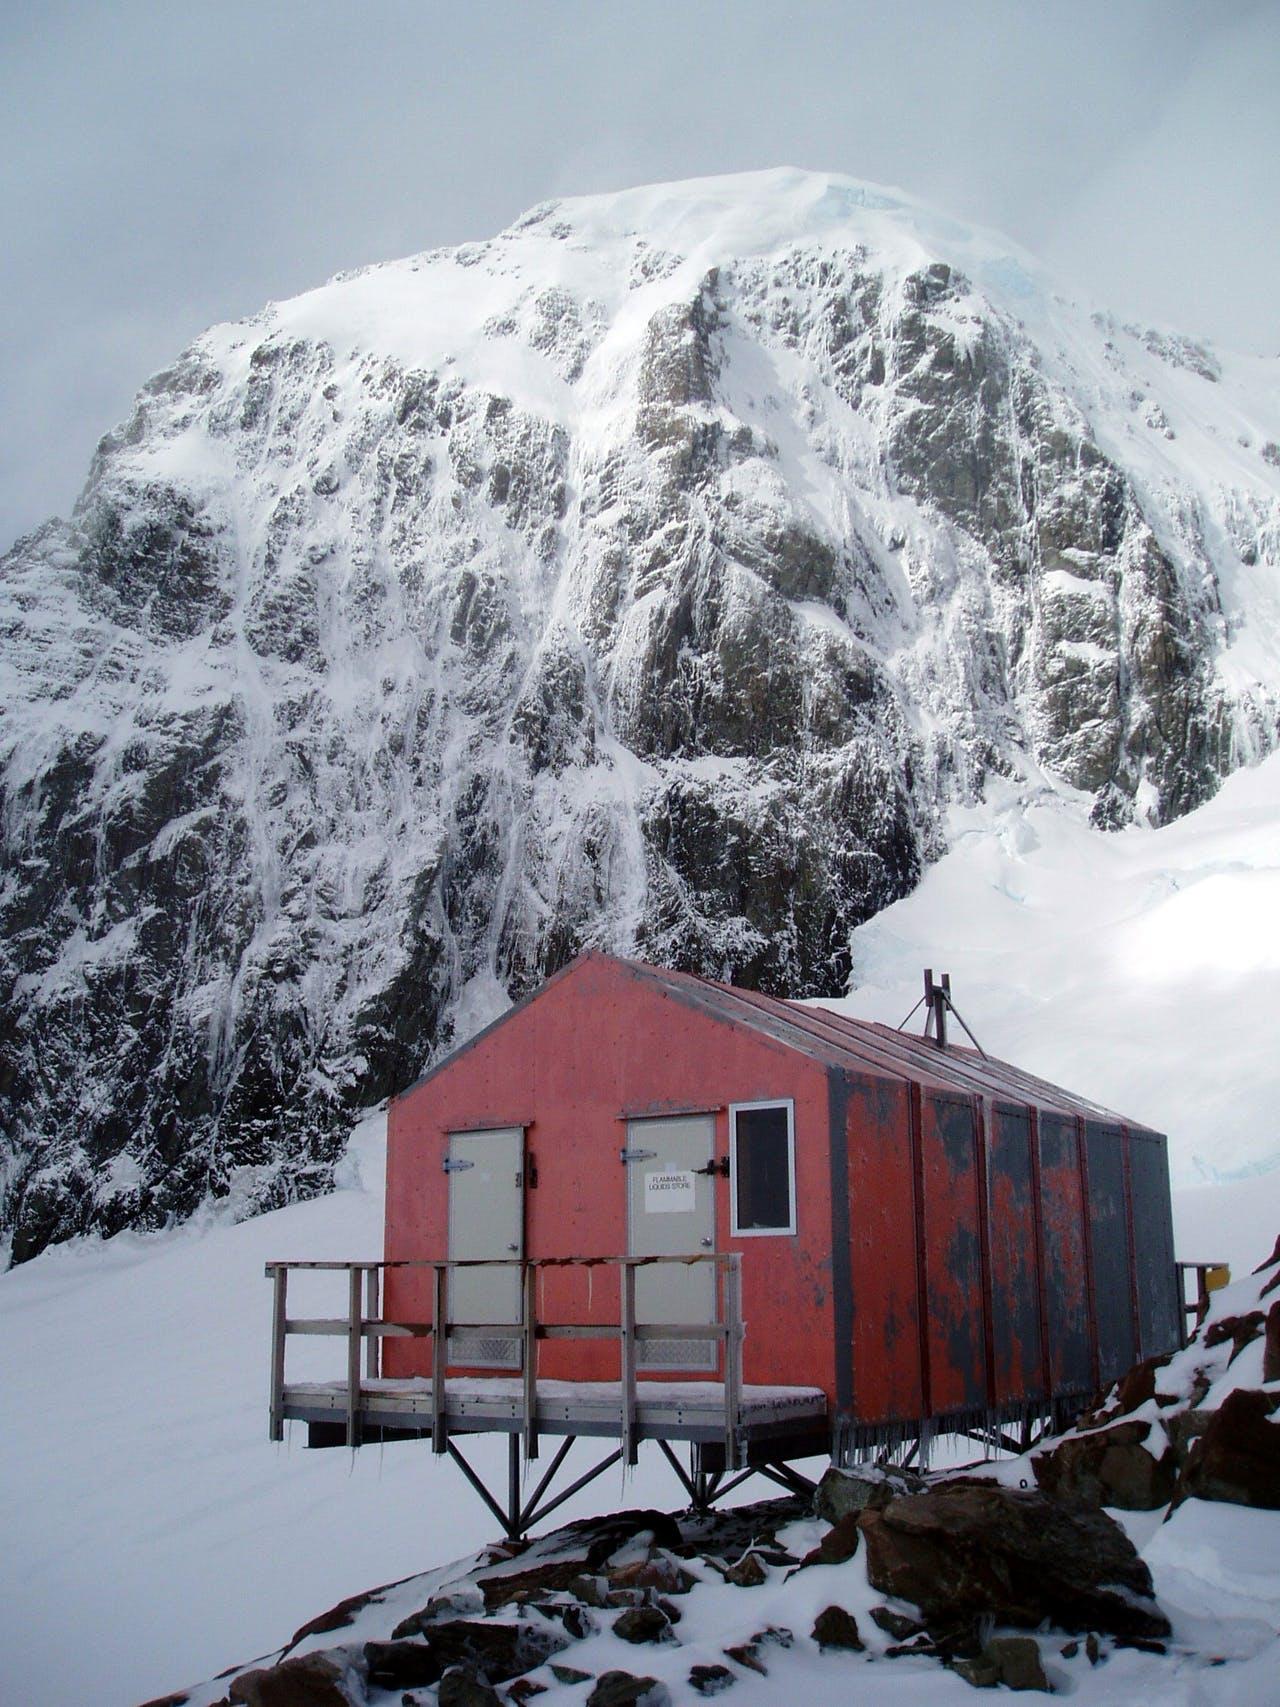 Empress Hut, Aoraki/Mt Cook National Park. Photo: Alison and Paul Stevenson